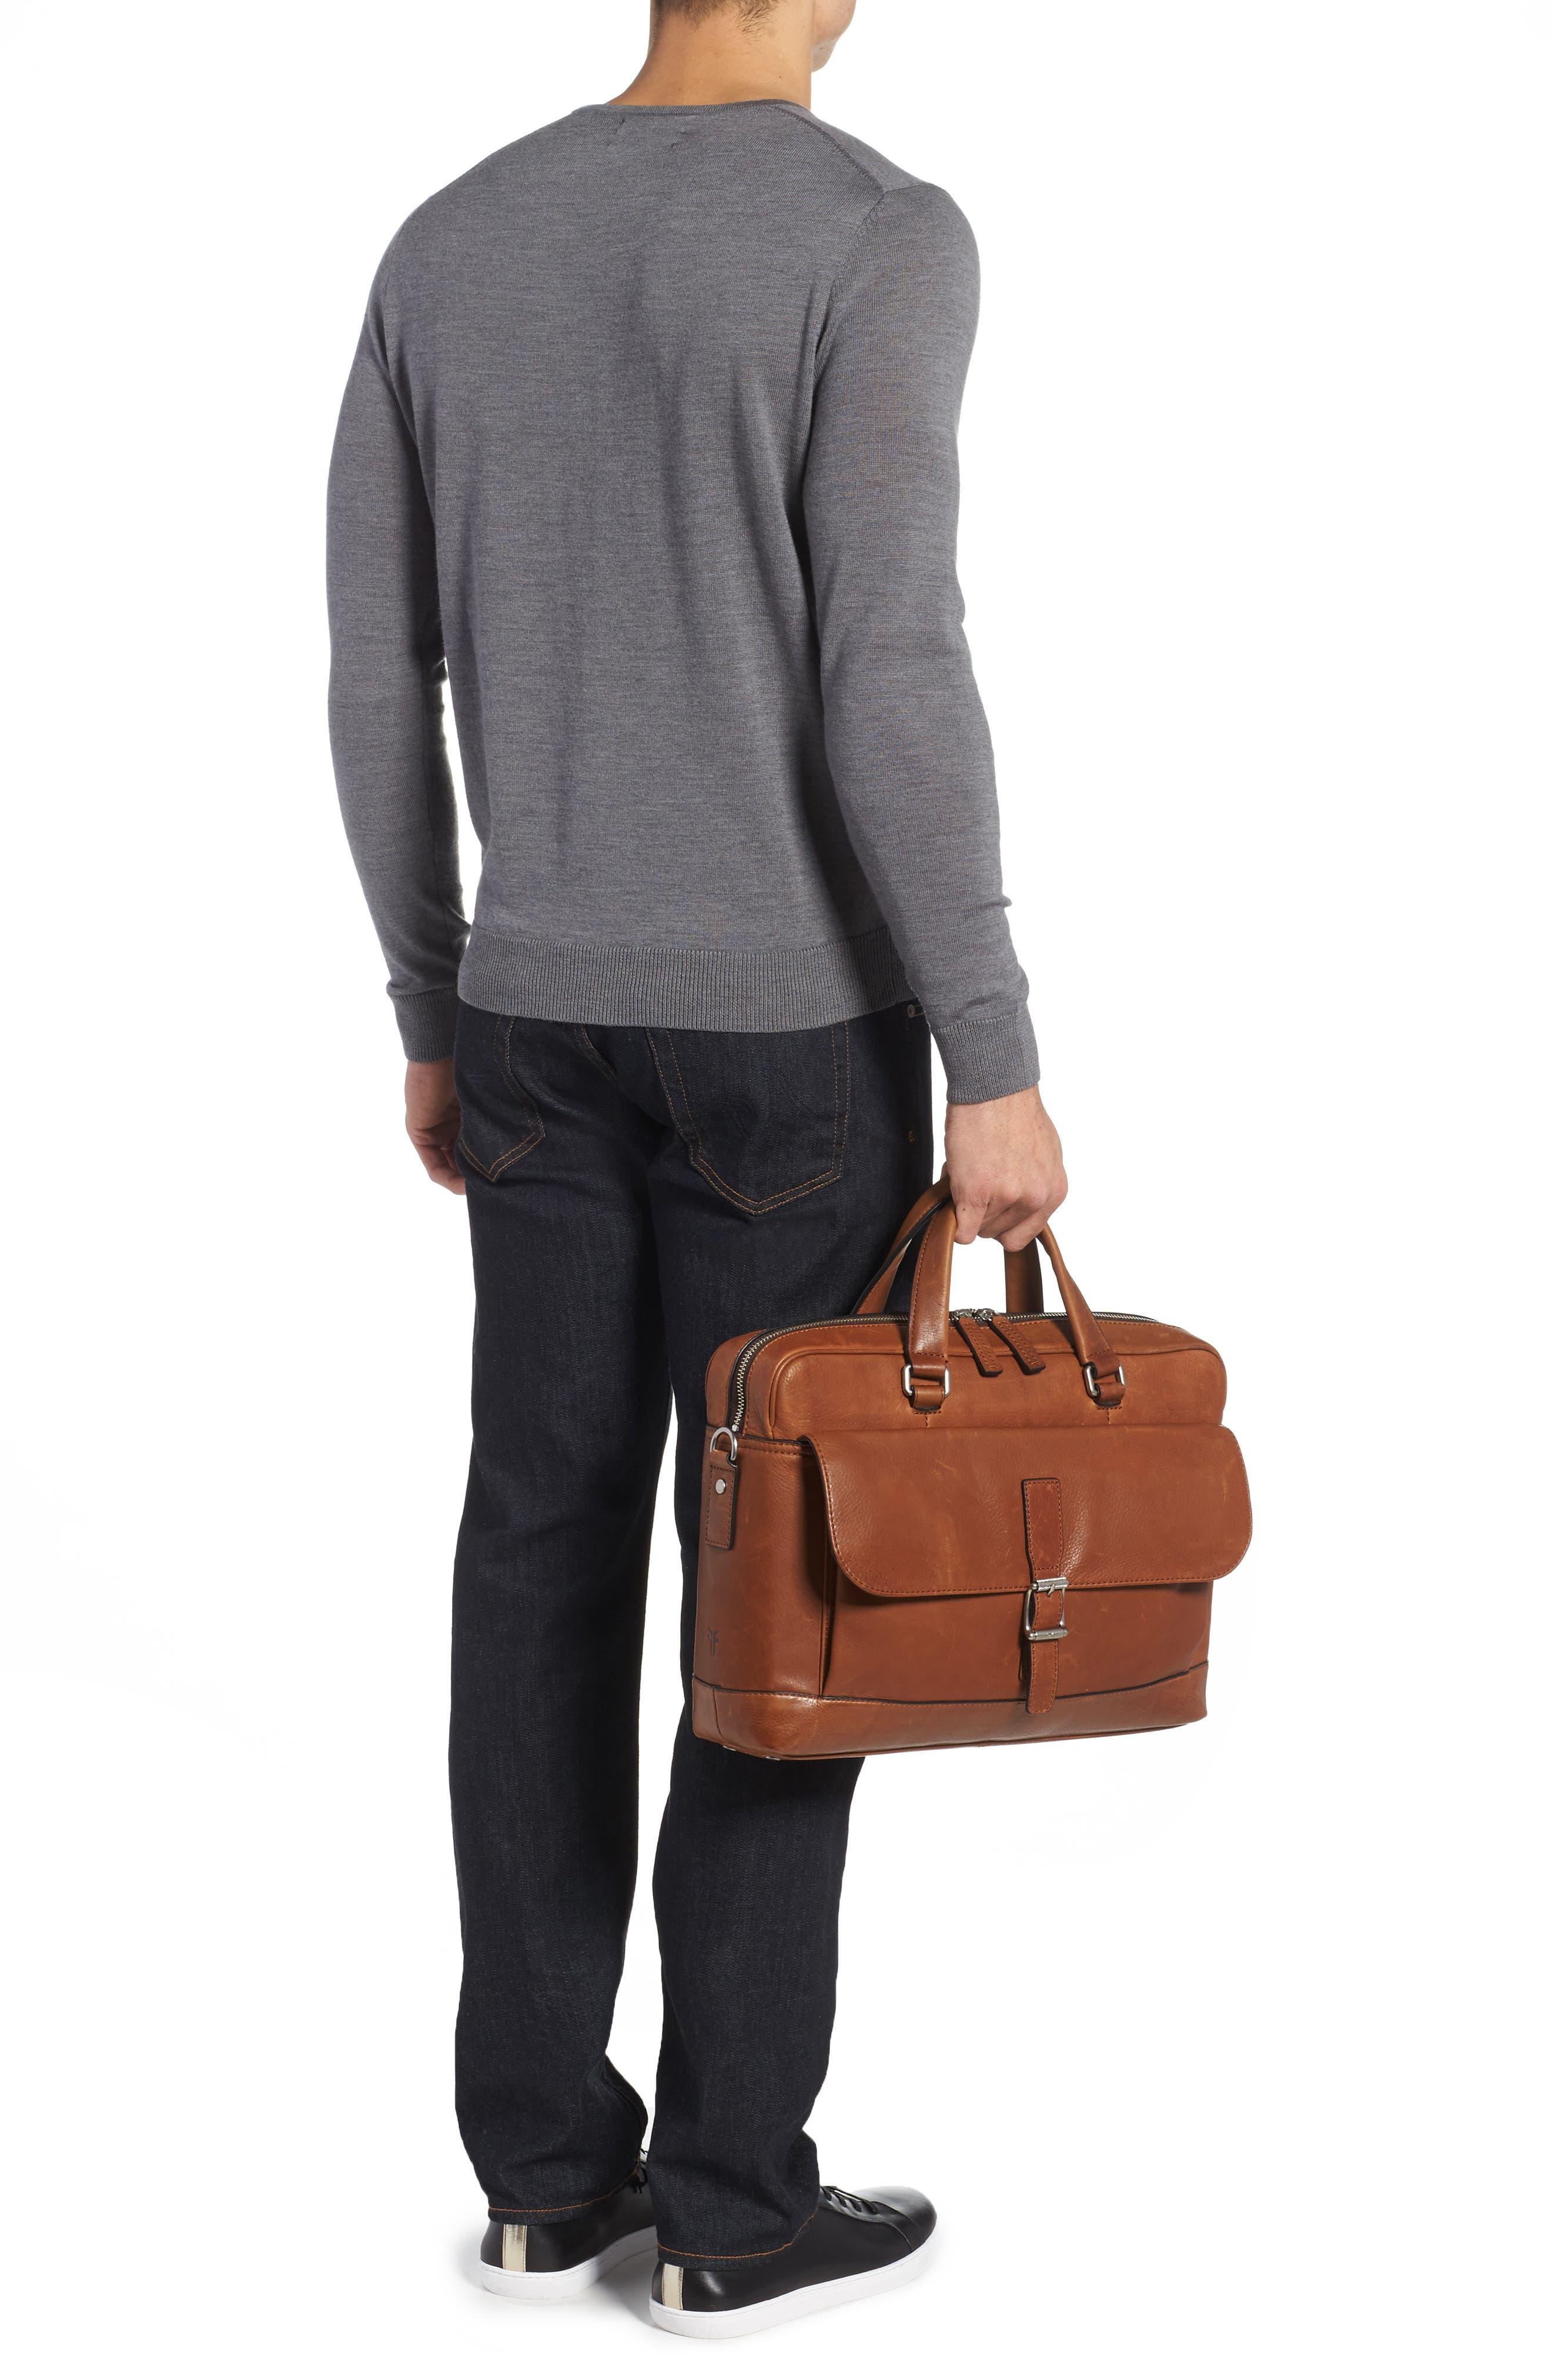 FRYE, Oliver Leather Briefcase, Alternate thumbnail 2, color, 235